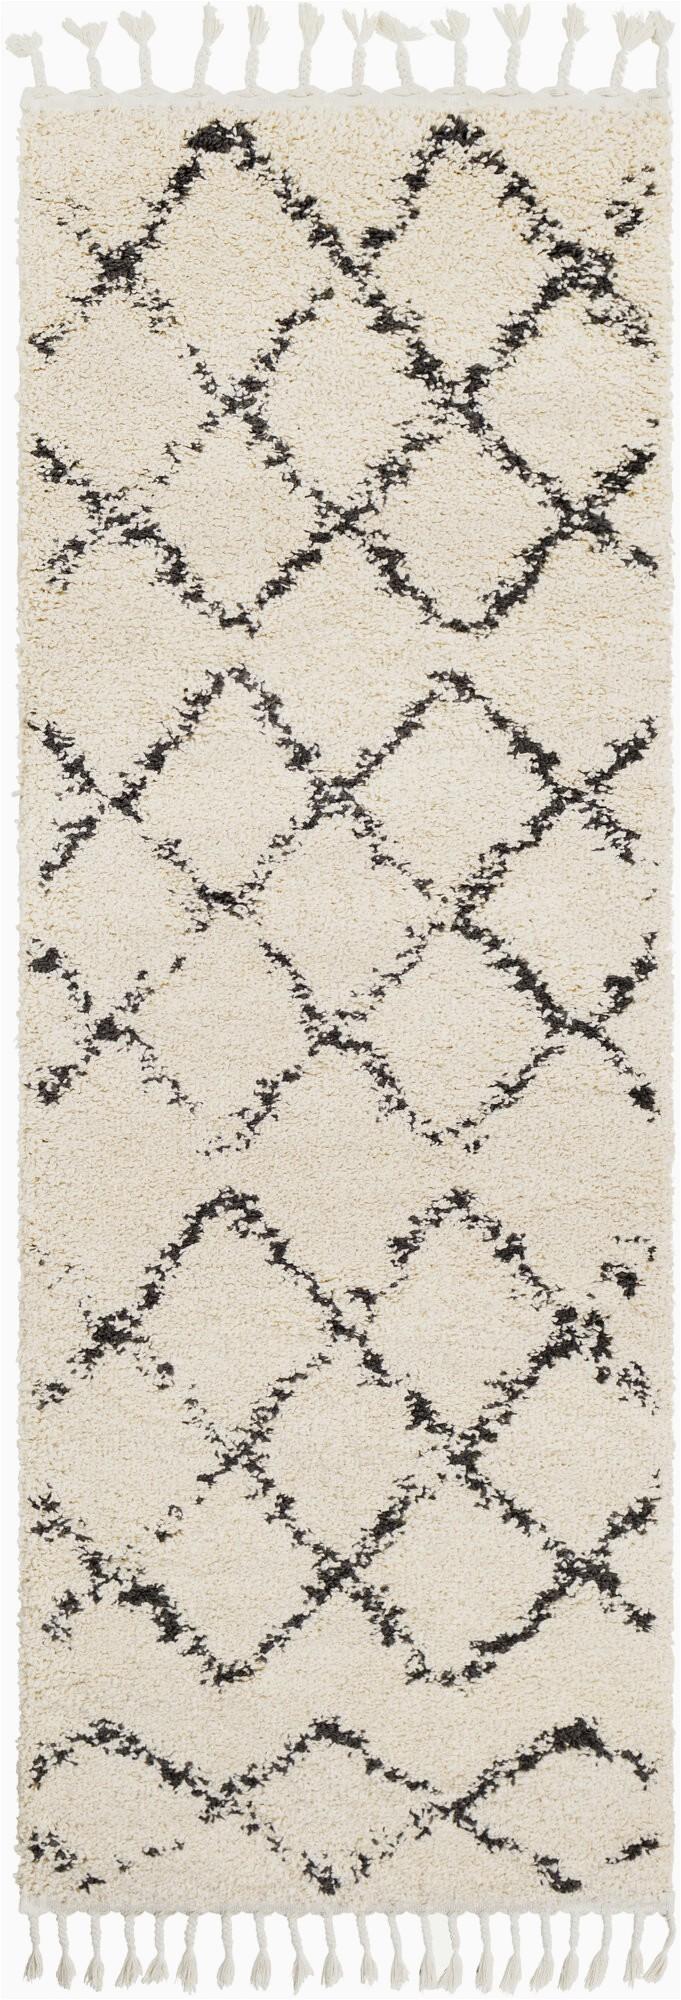 foundstone margaret charcoalbeige area rug w piid=